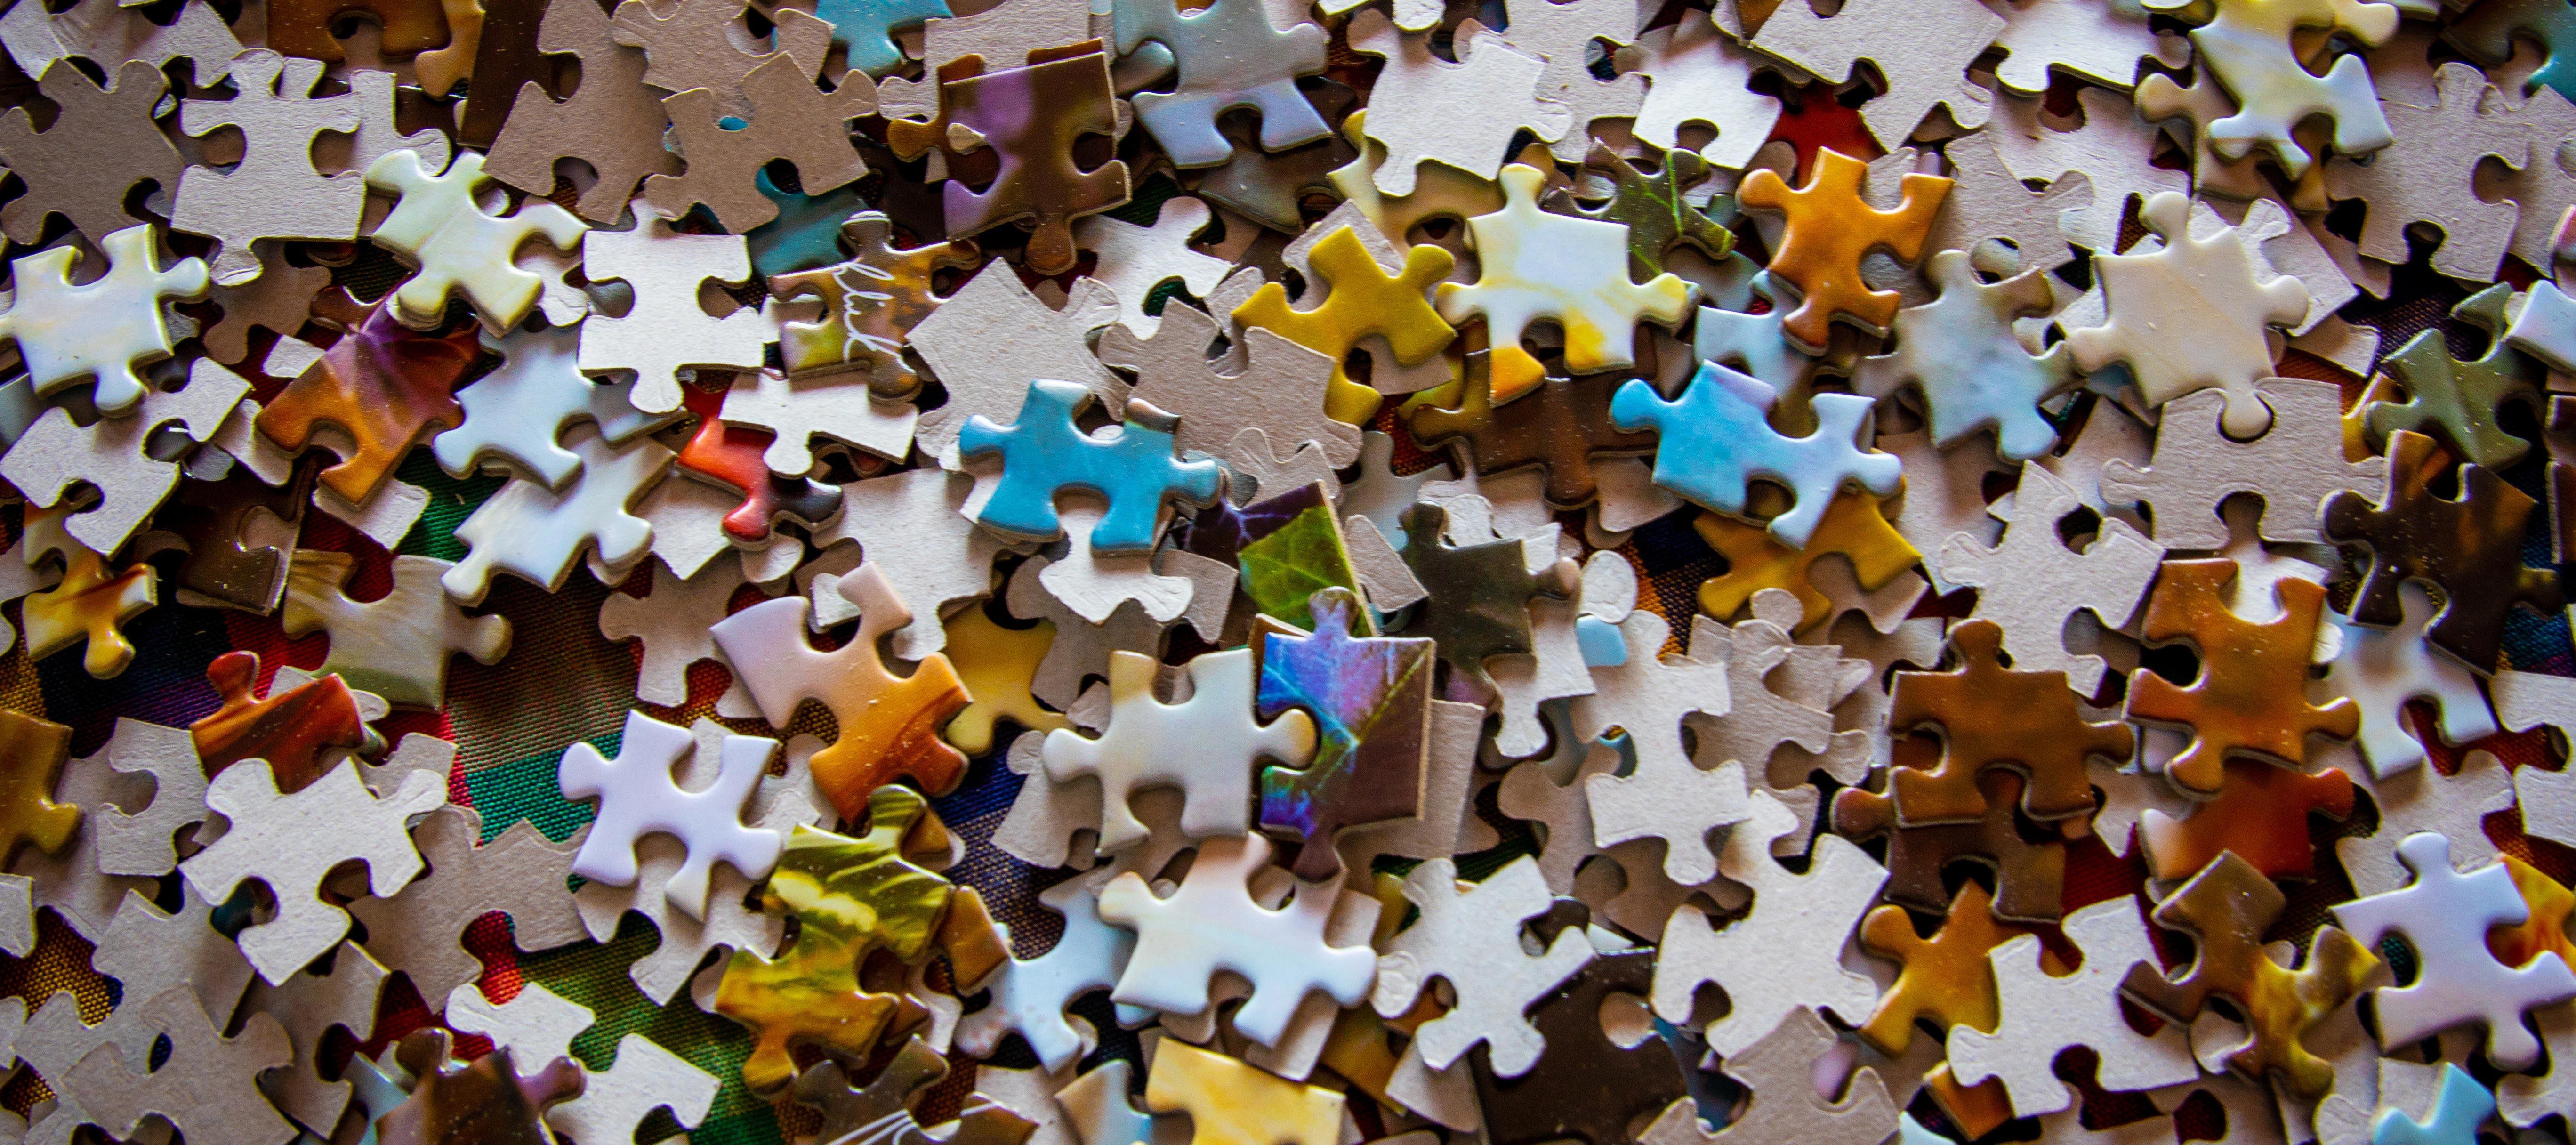 ringer-fundraising-blog-featured-image-puzzle